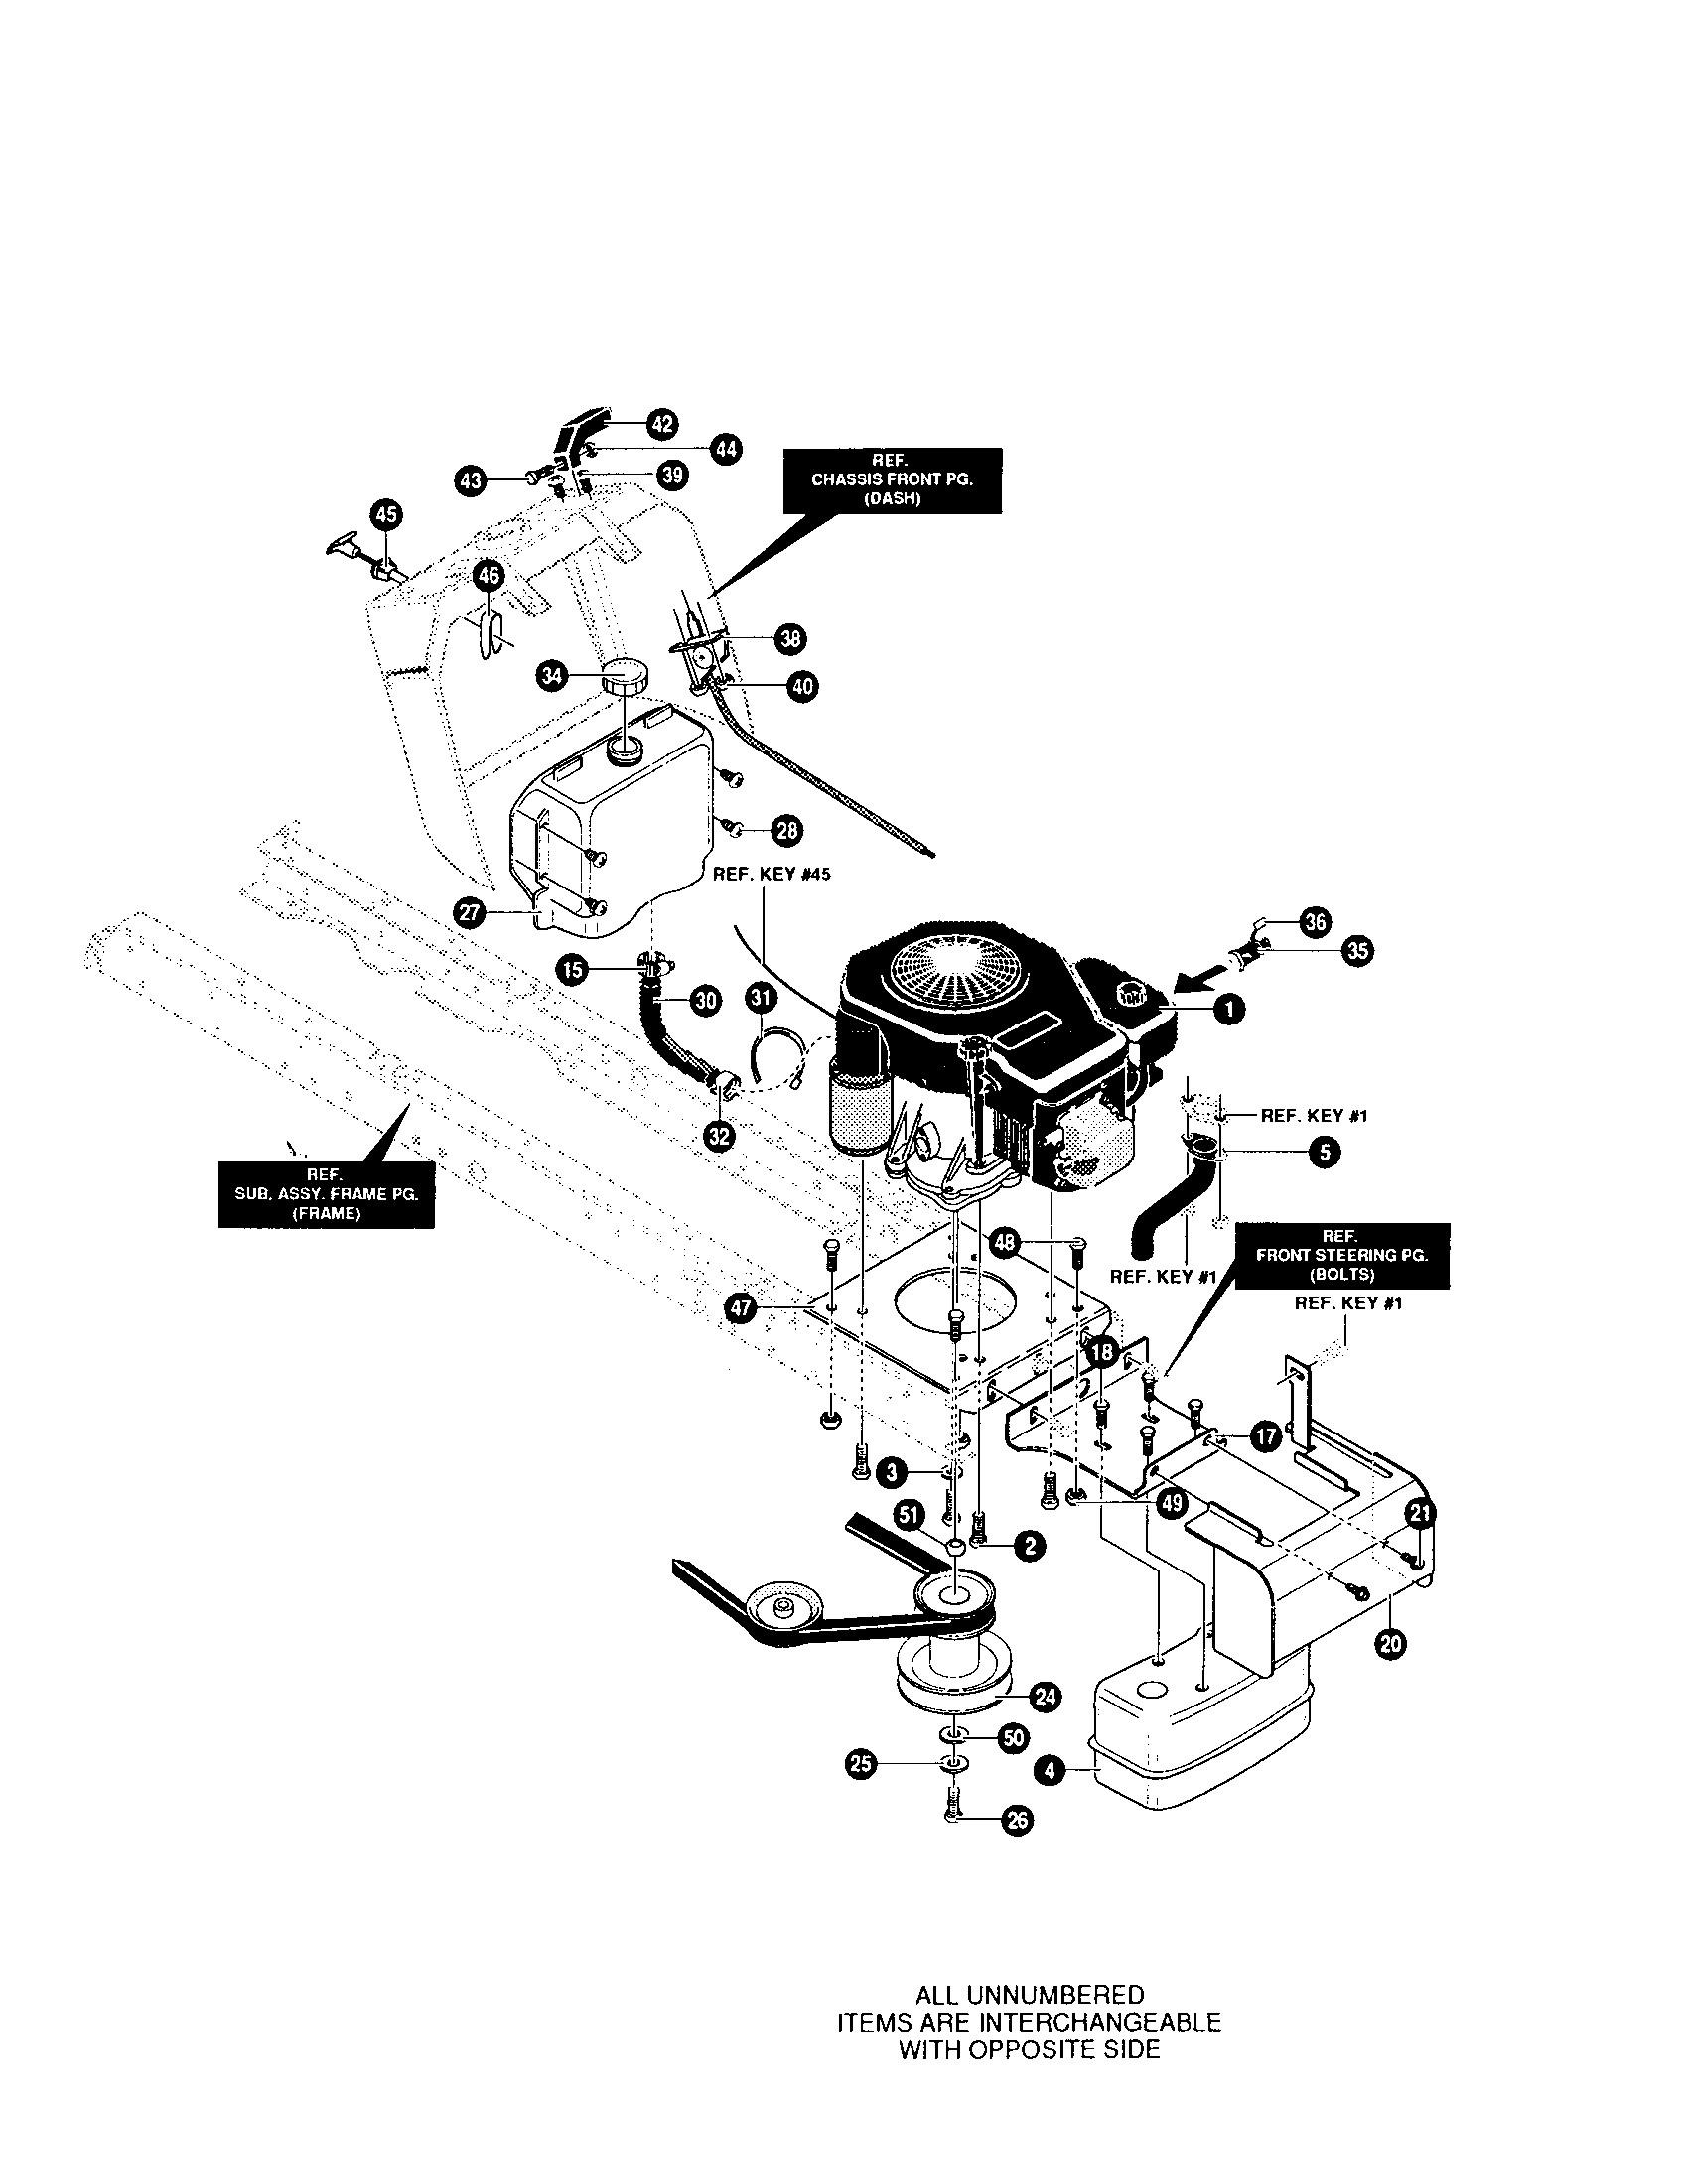 20 Hp Kohler Engine Diagram Motor Parts Kohler Motor Parts Of 20 Hp Kohler Engine Diagram